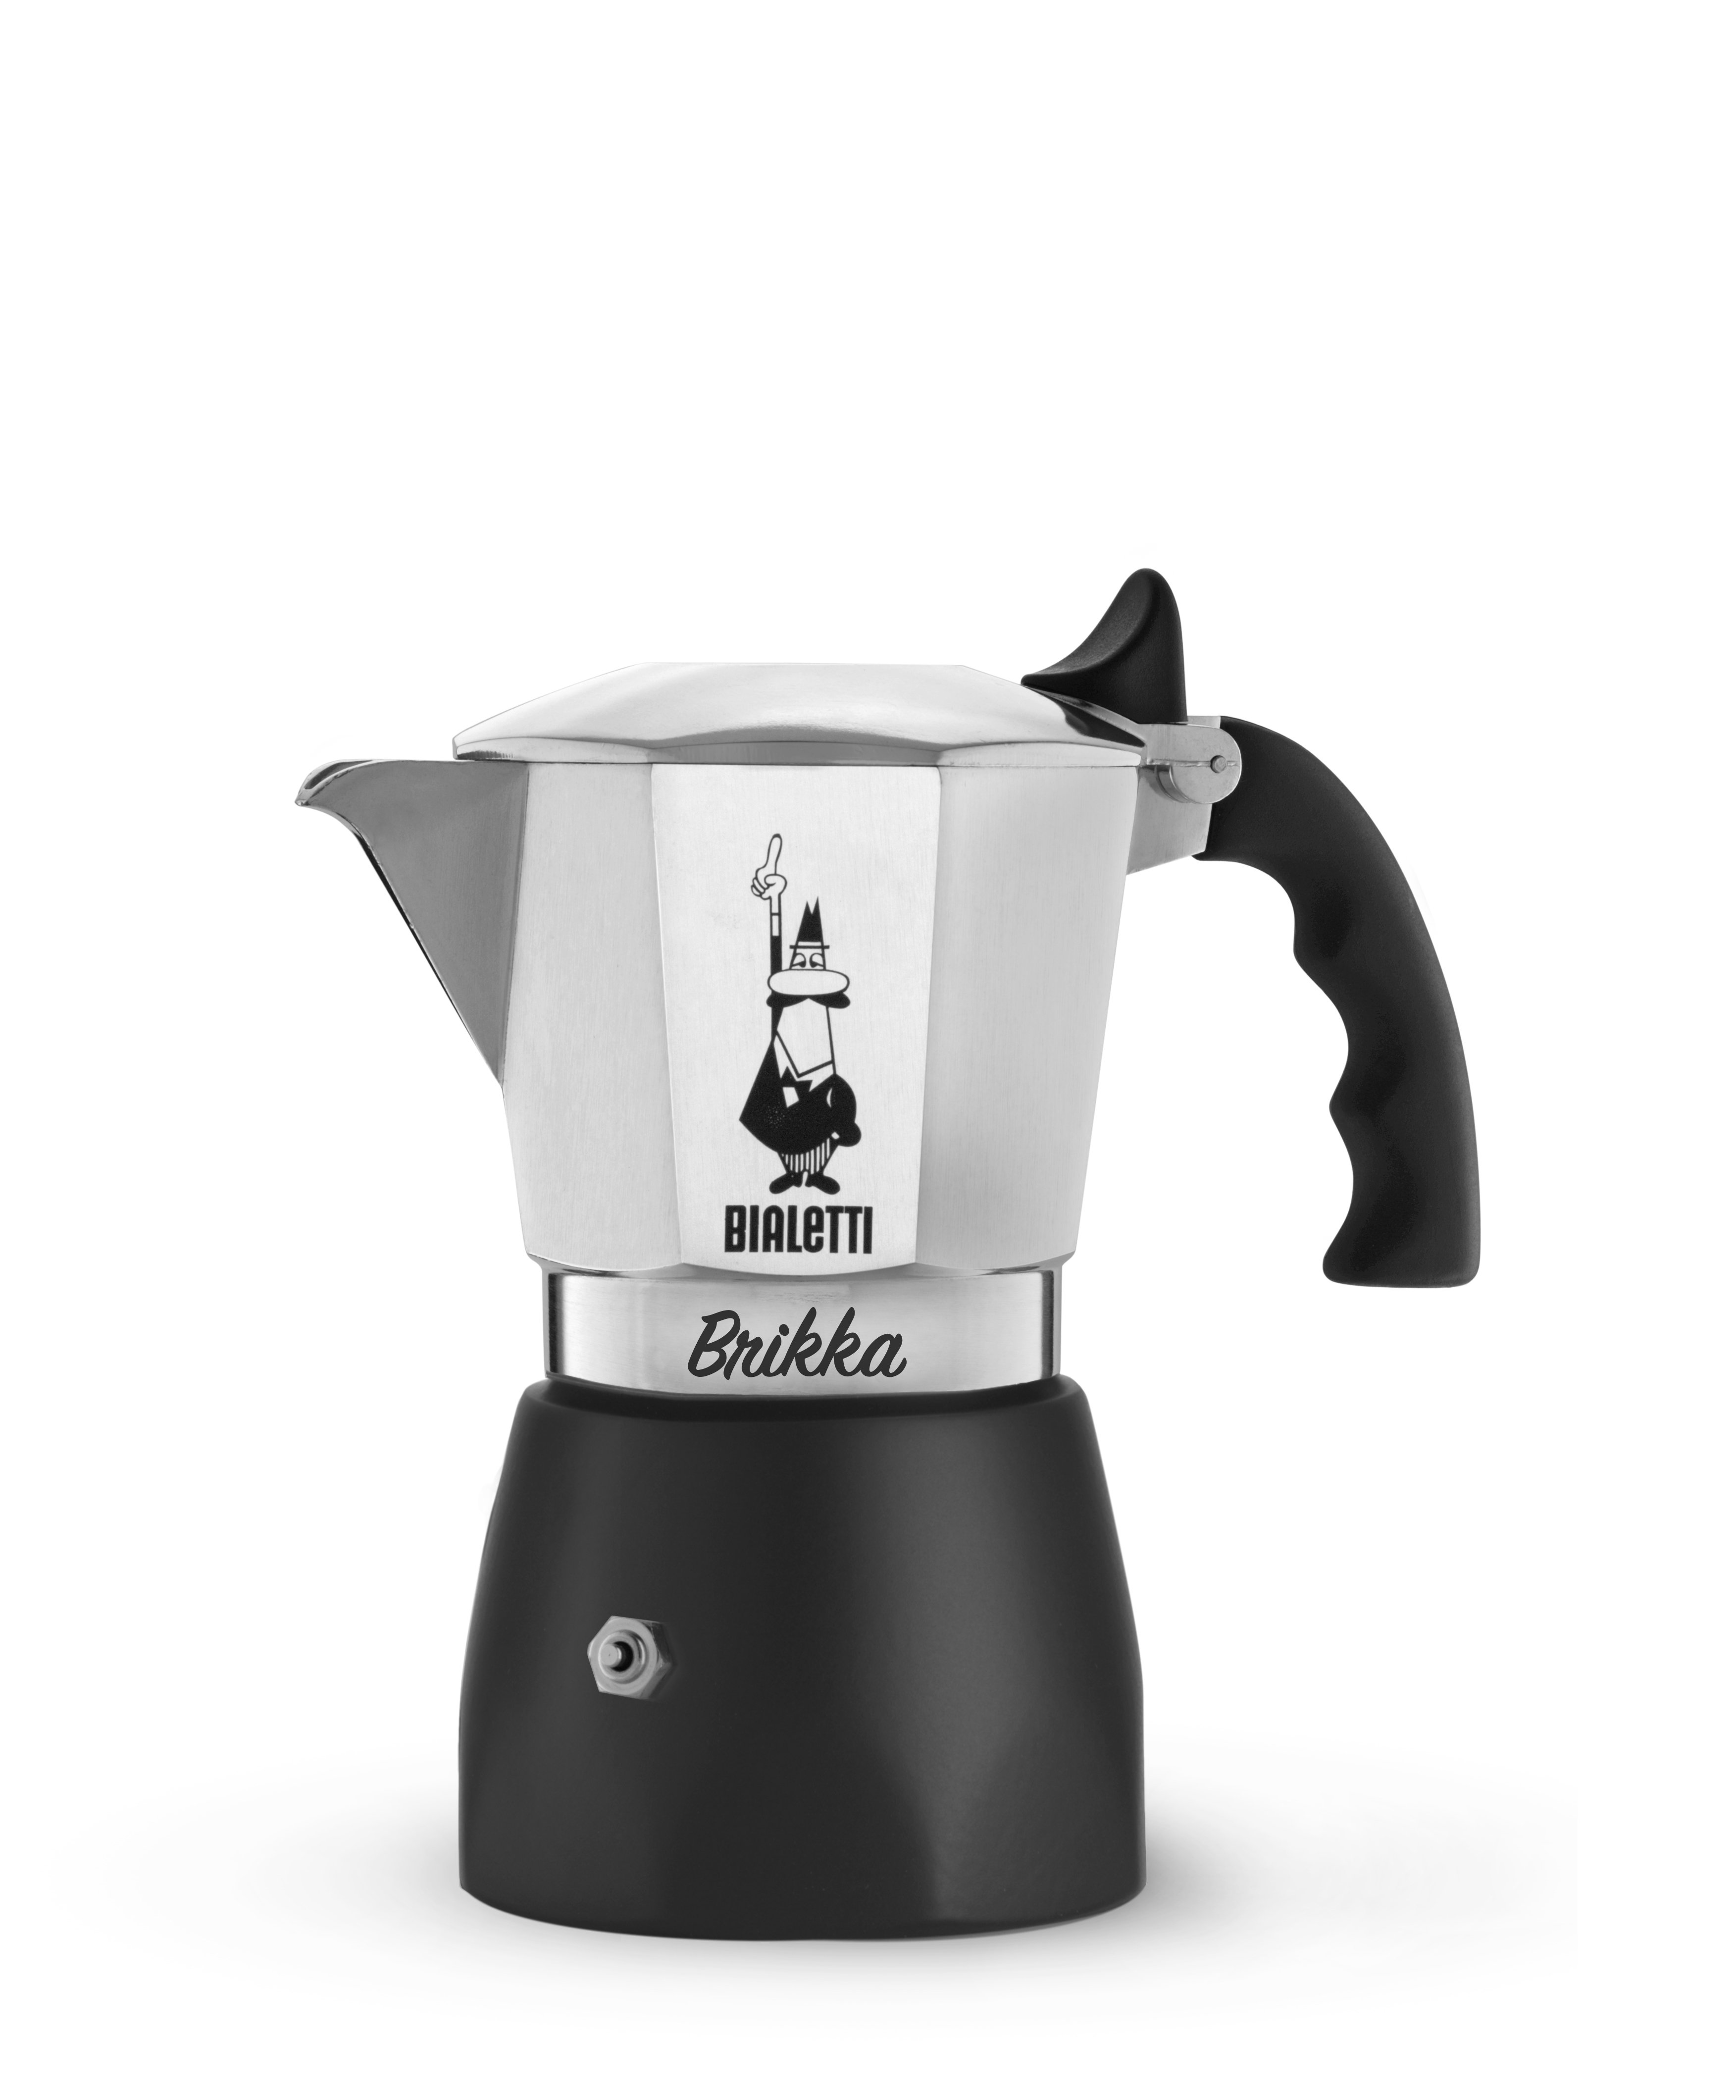 Bialetti - Brikka Edition 2.0 - 2 Cups - Silver (7312)